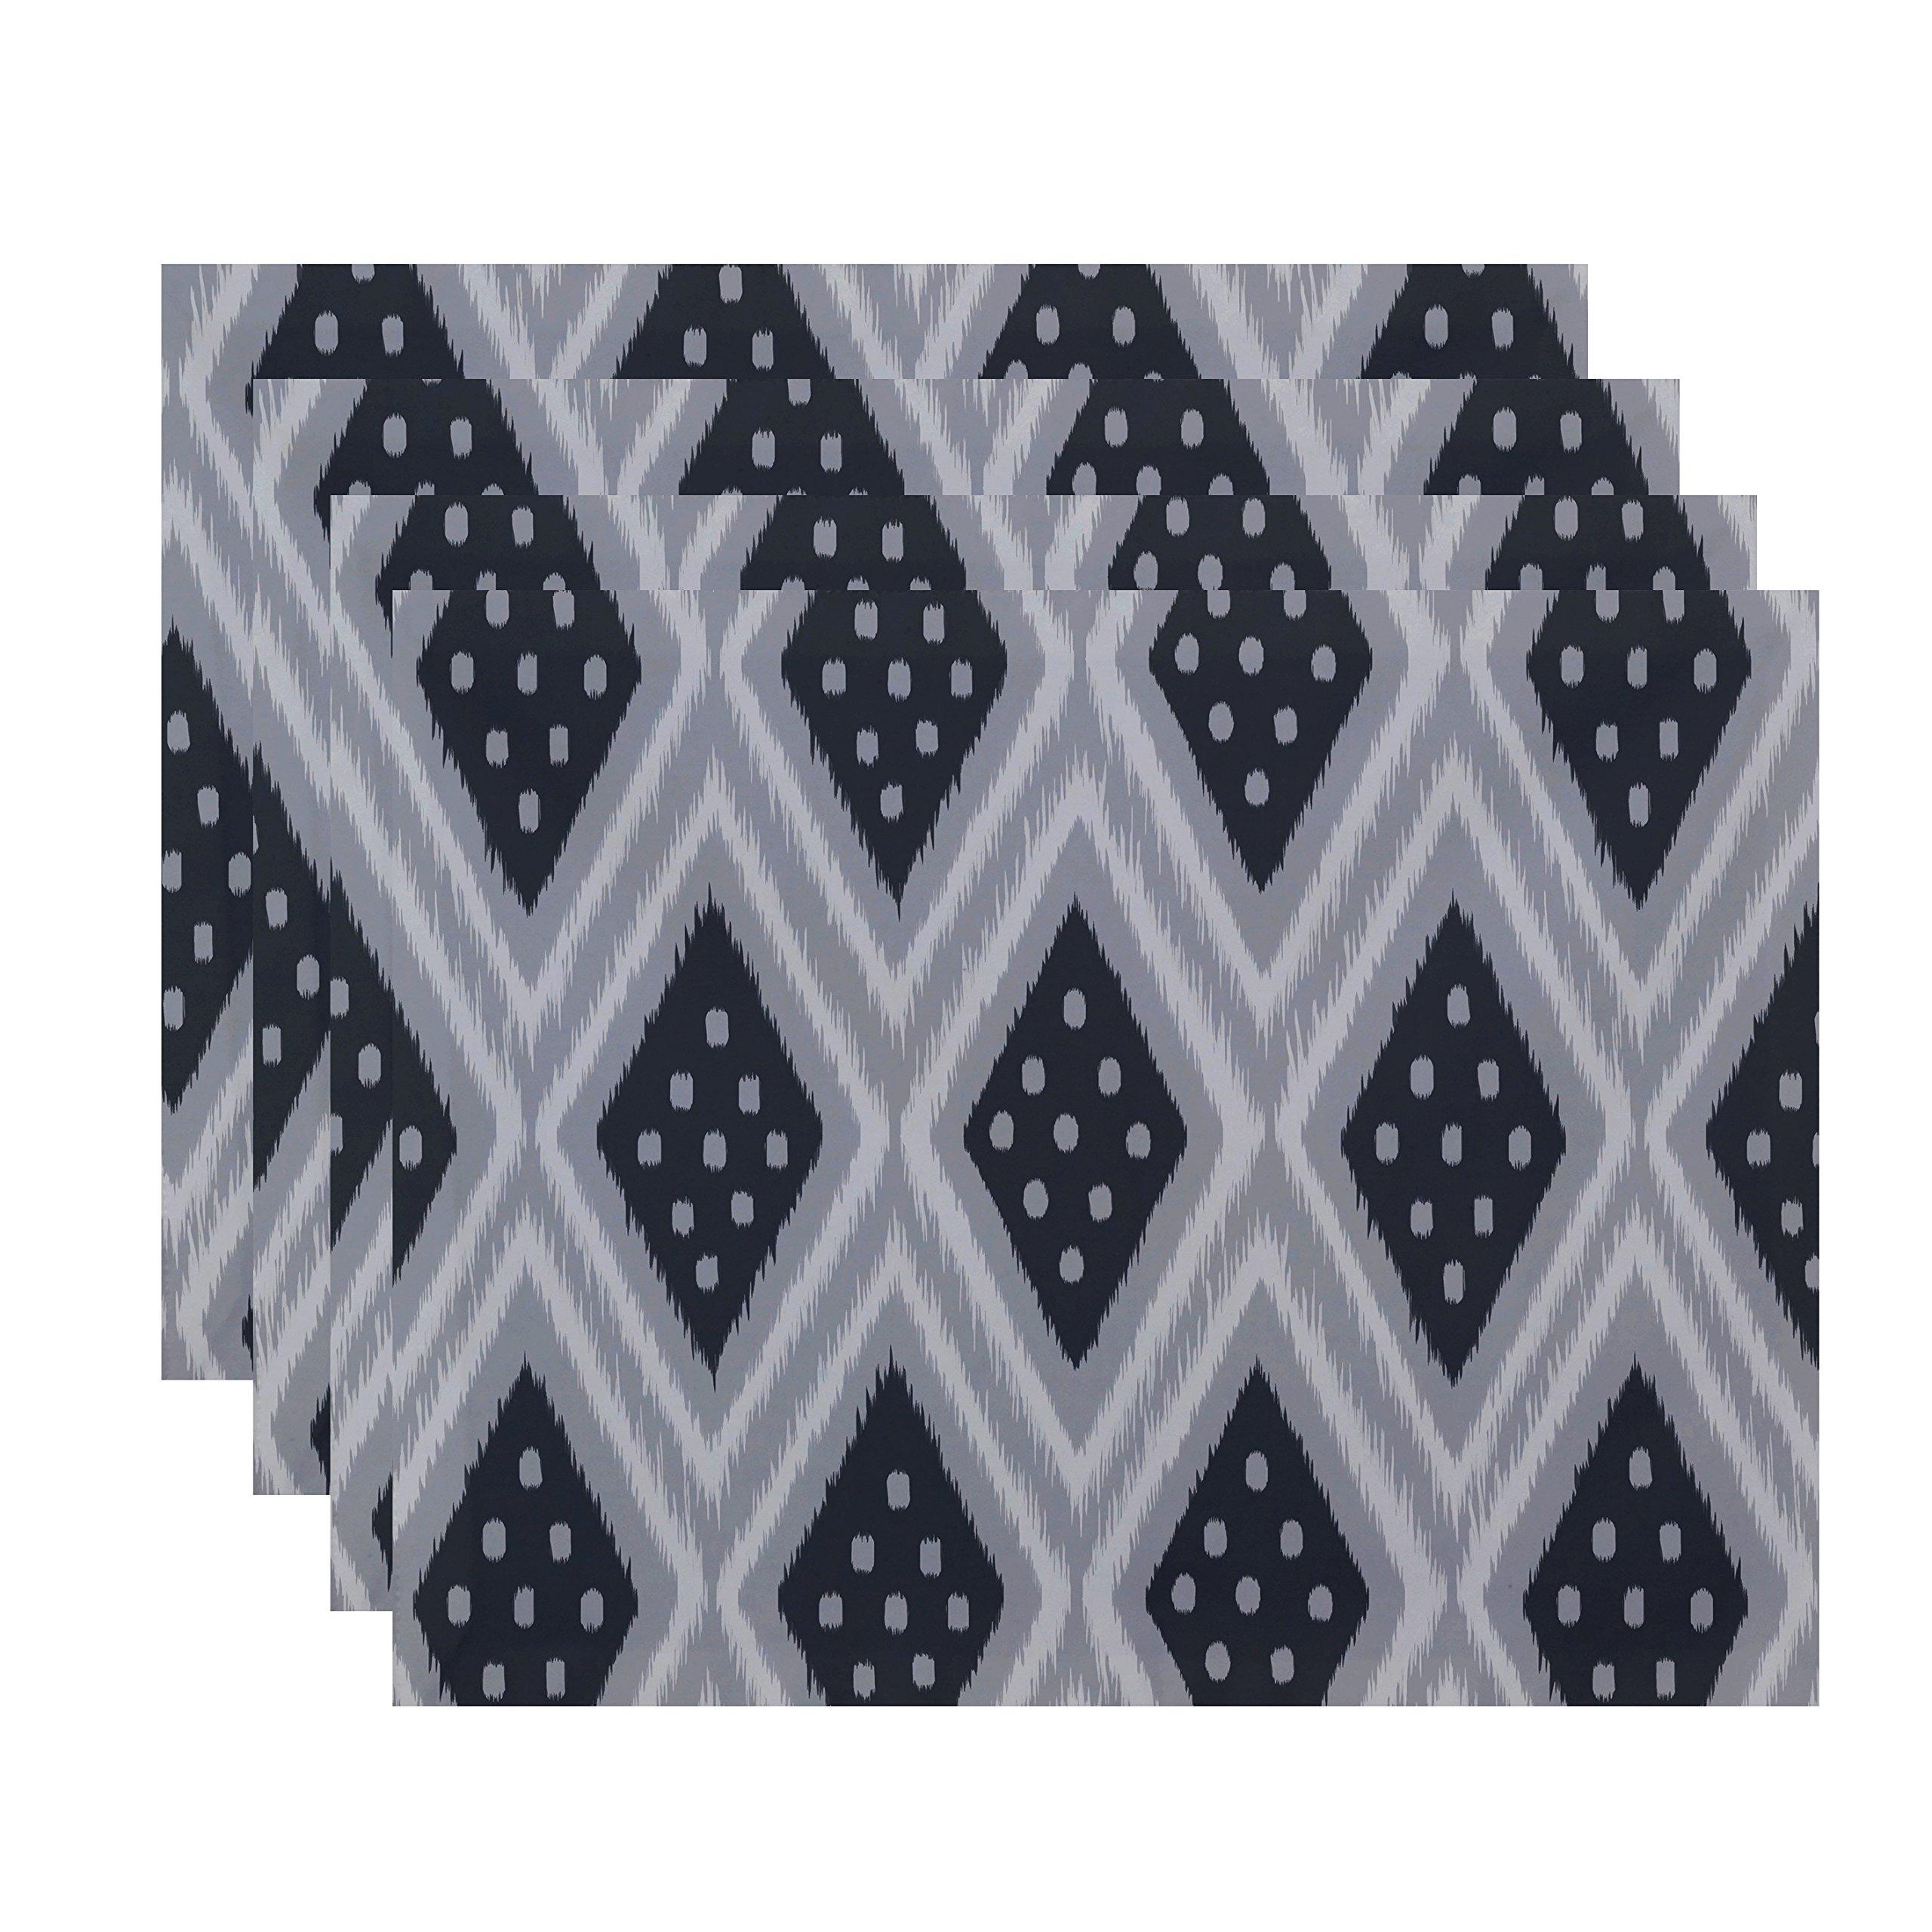 E By Design Ikat Diamond Dot Geometric Print Placement, 18'' by 14'', Steel Gray